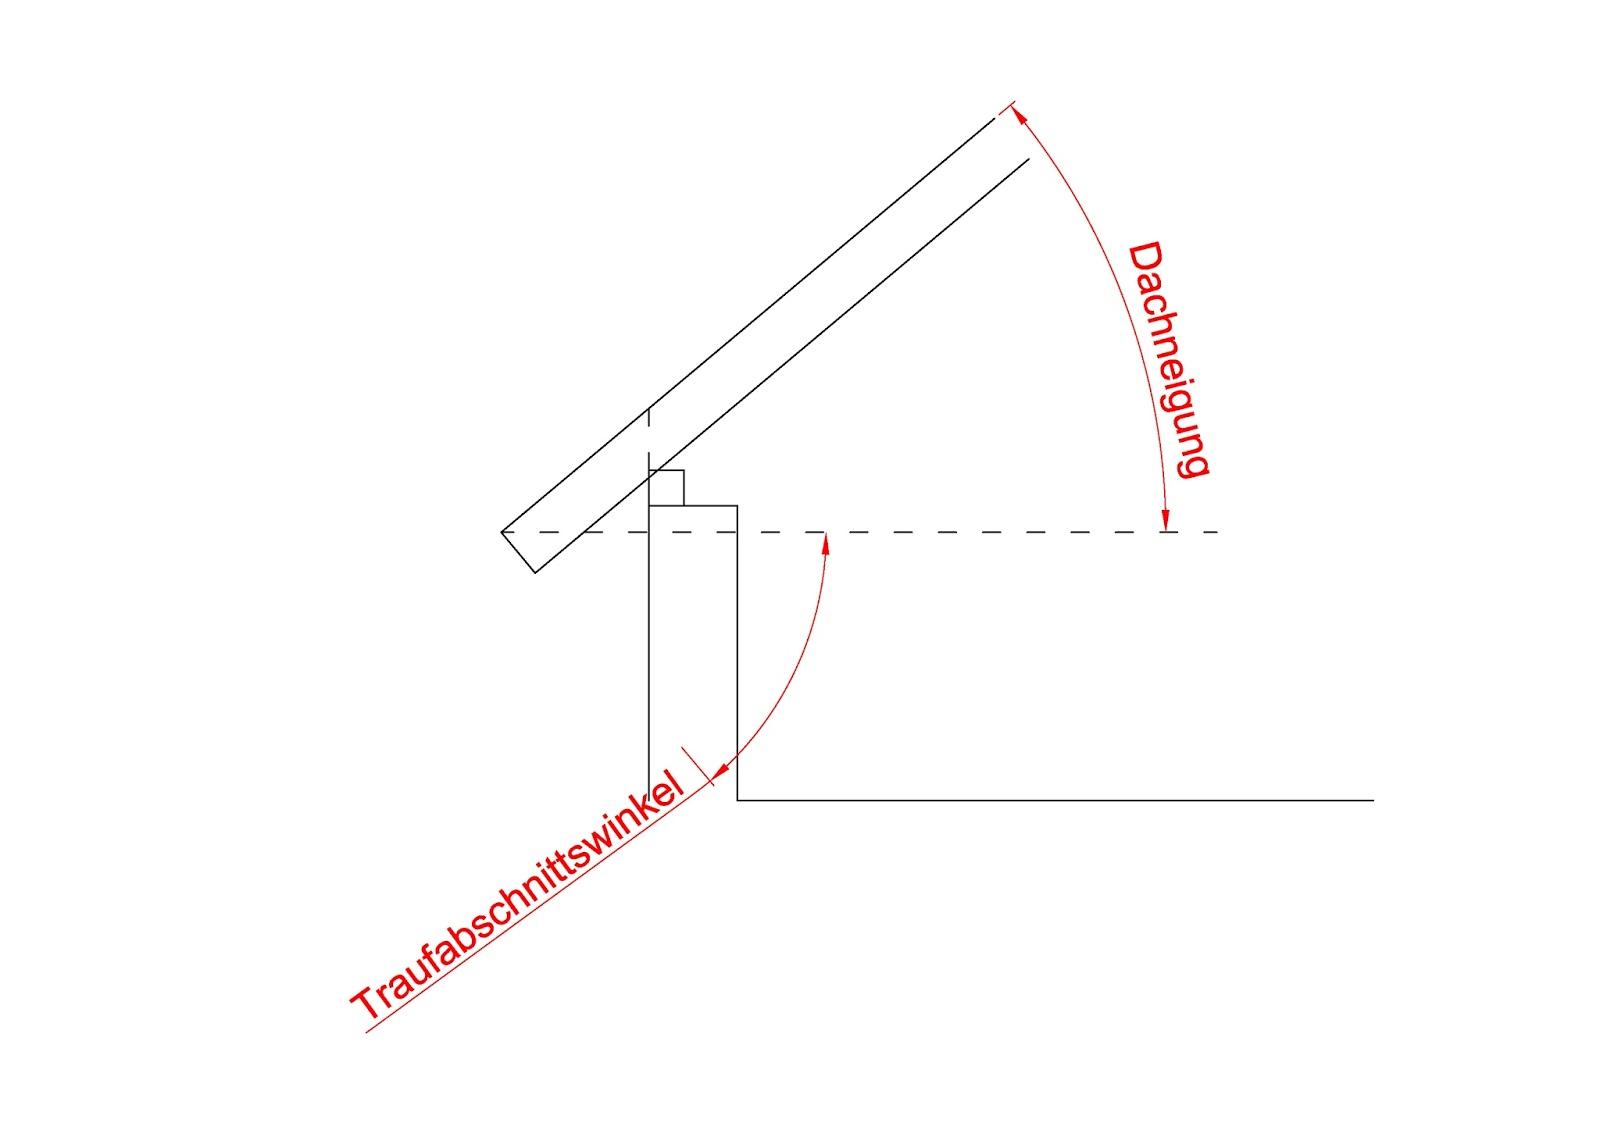 Roof Framing Geometry: German Roof Framing Translations to English